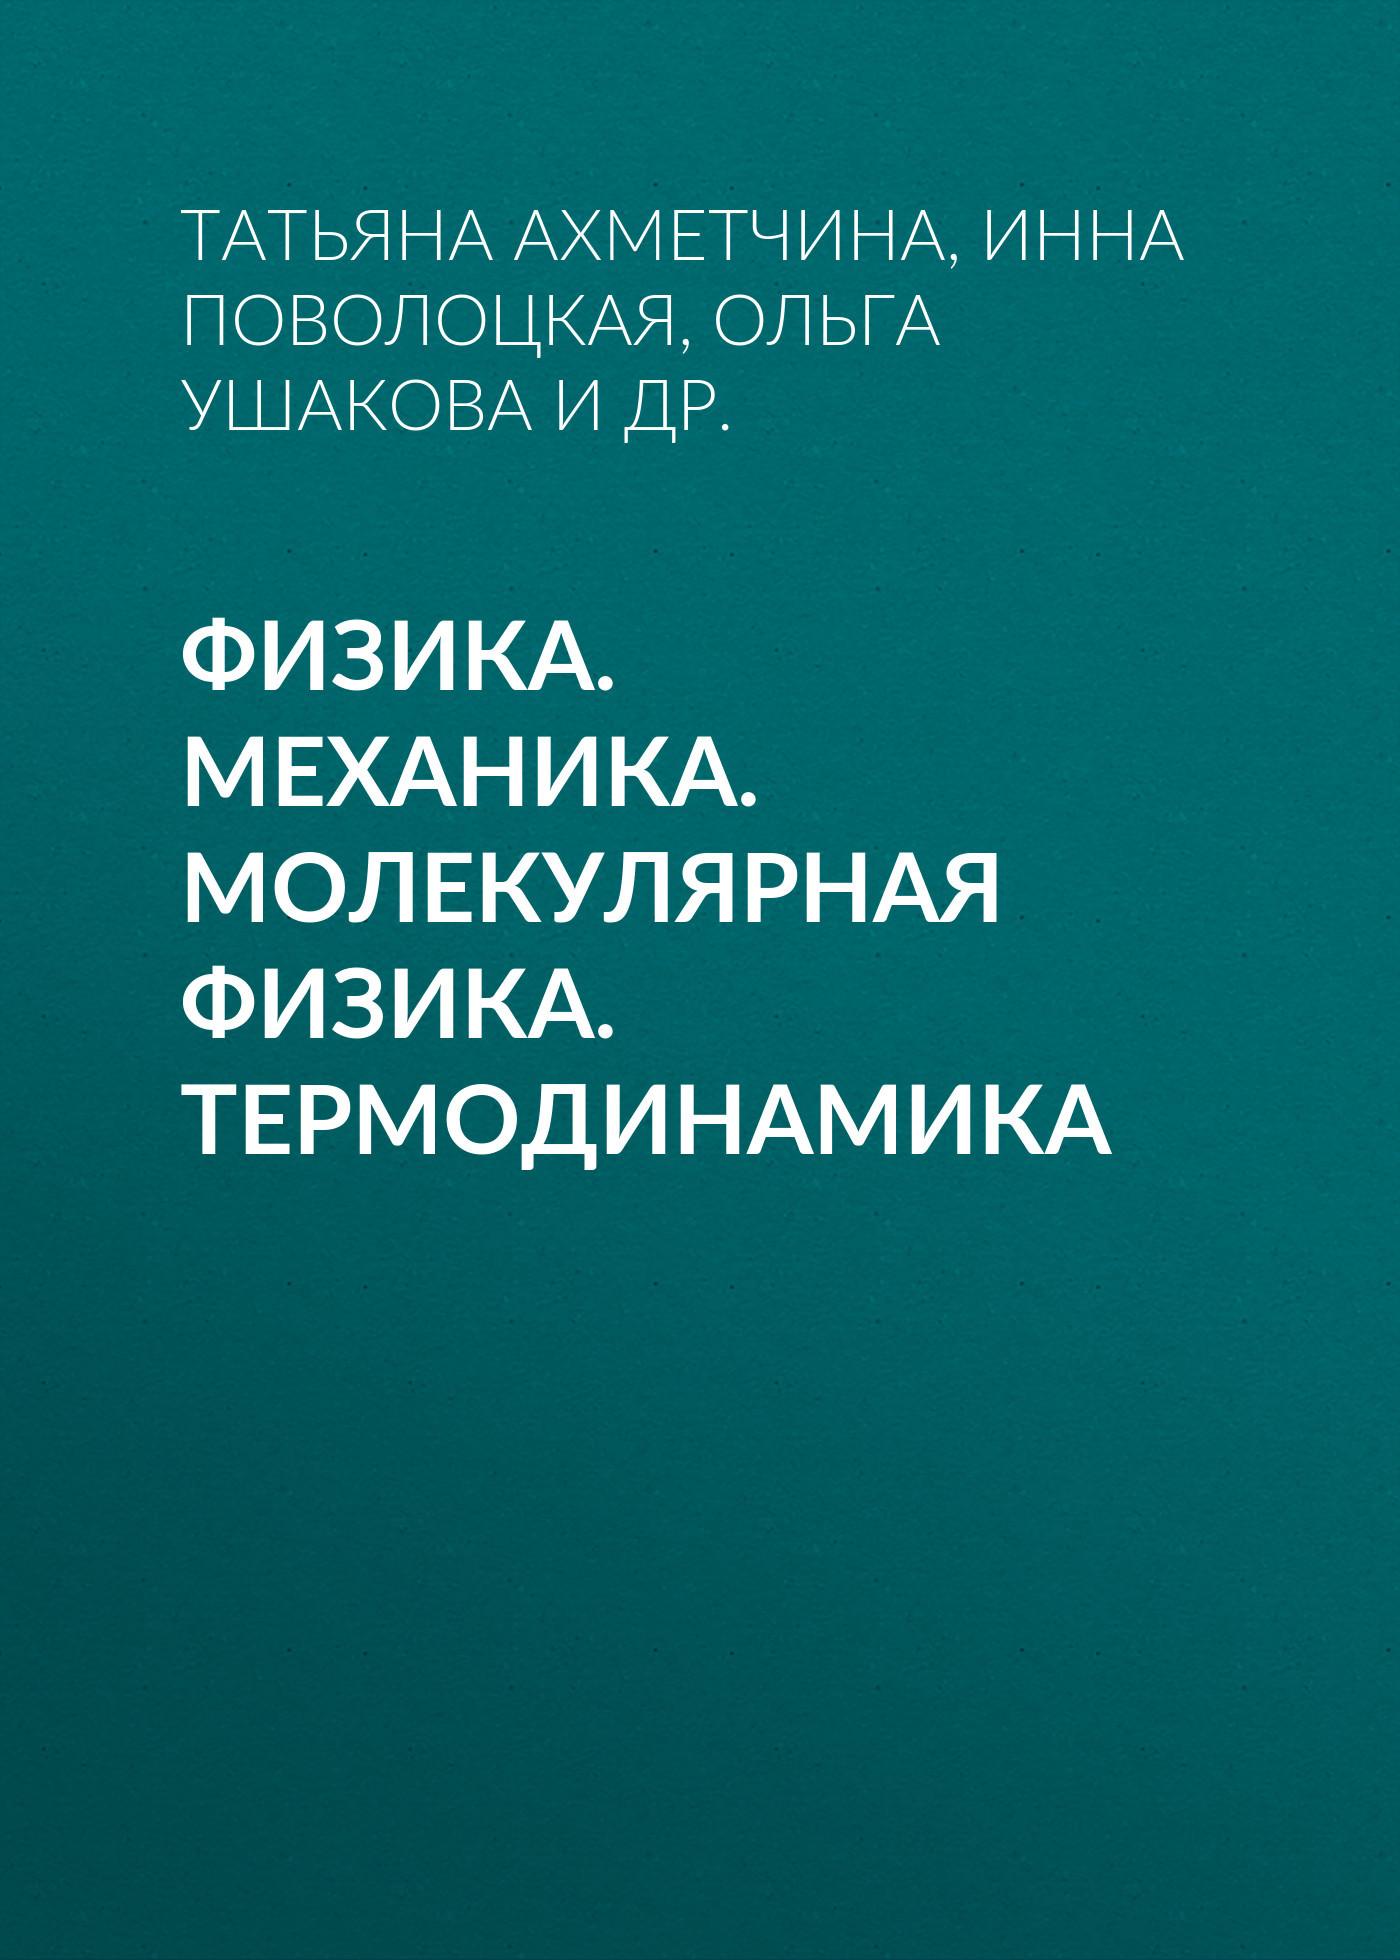 Ольга Ушакова. Физика. Механика. Молекулярная физика. Термодинамика